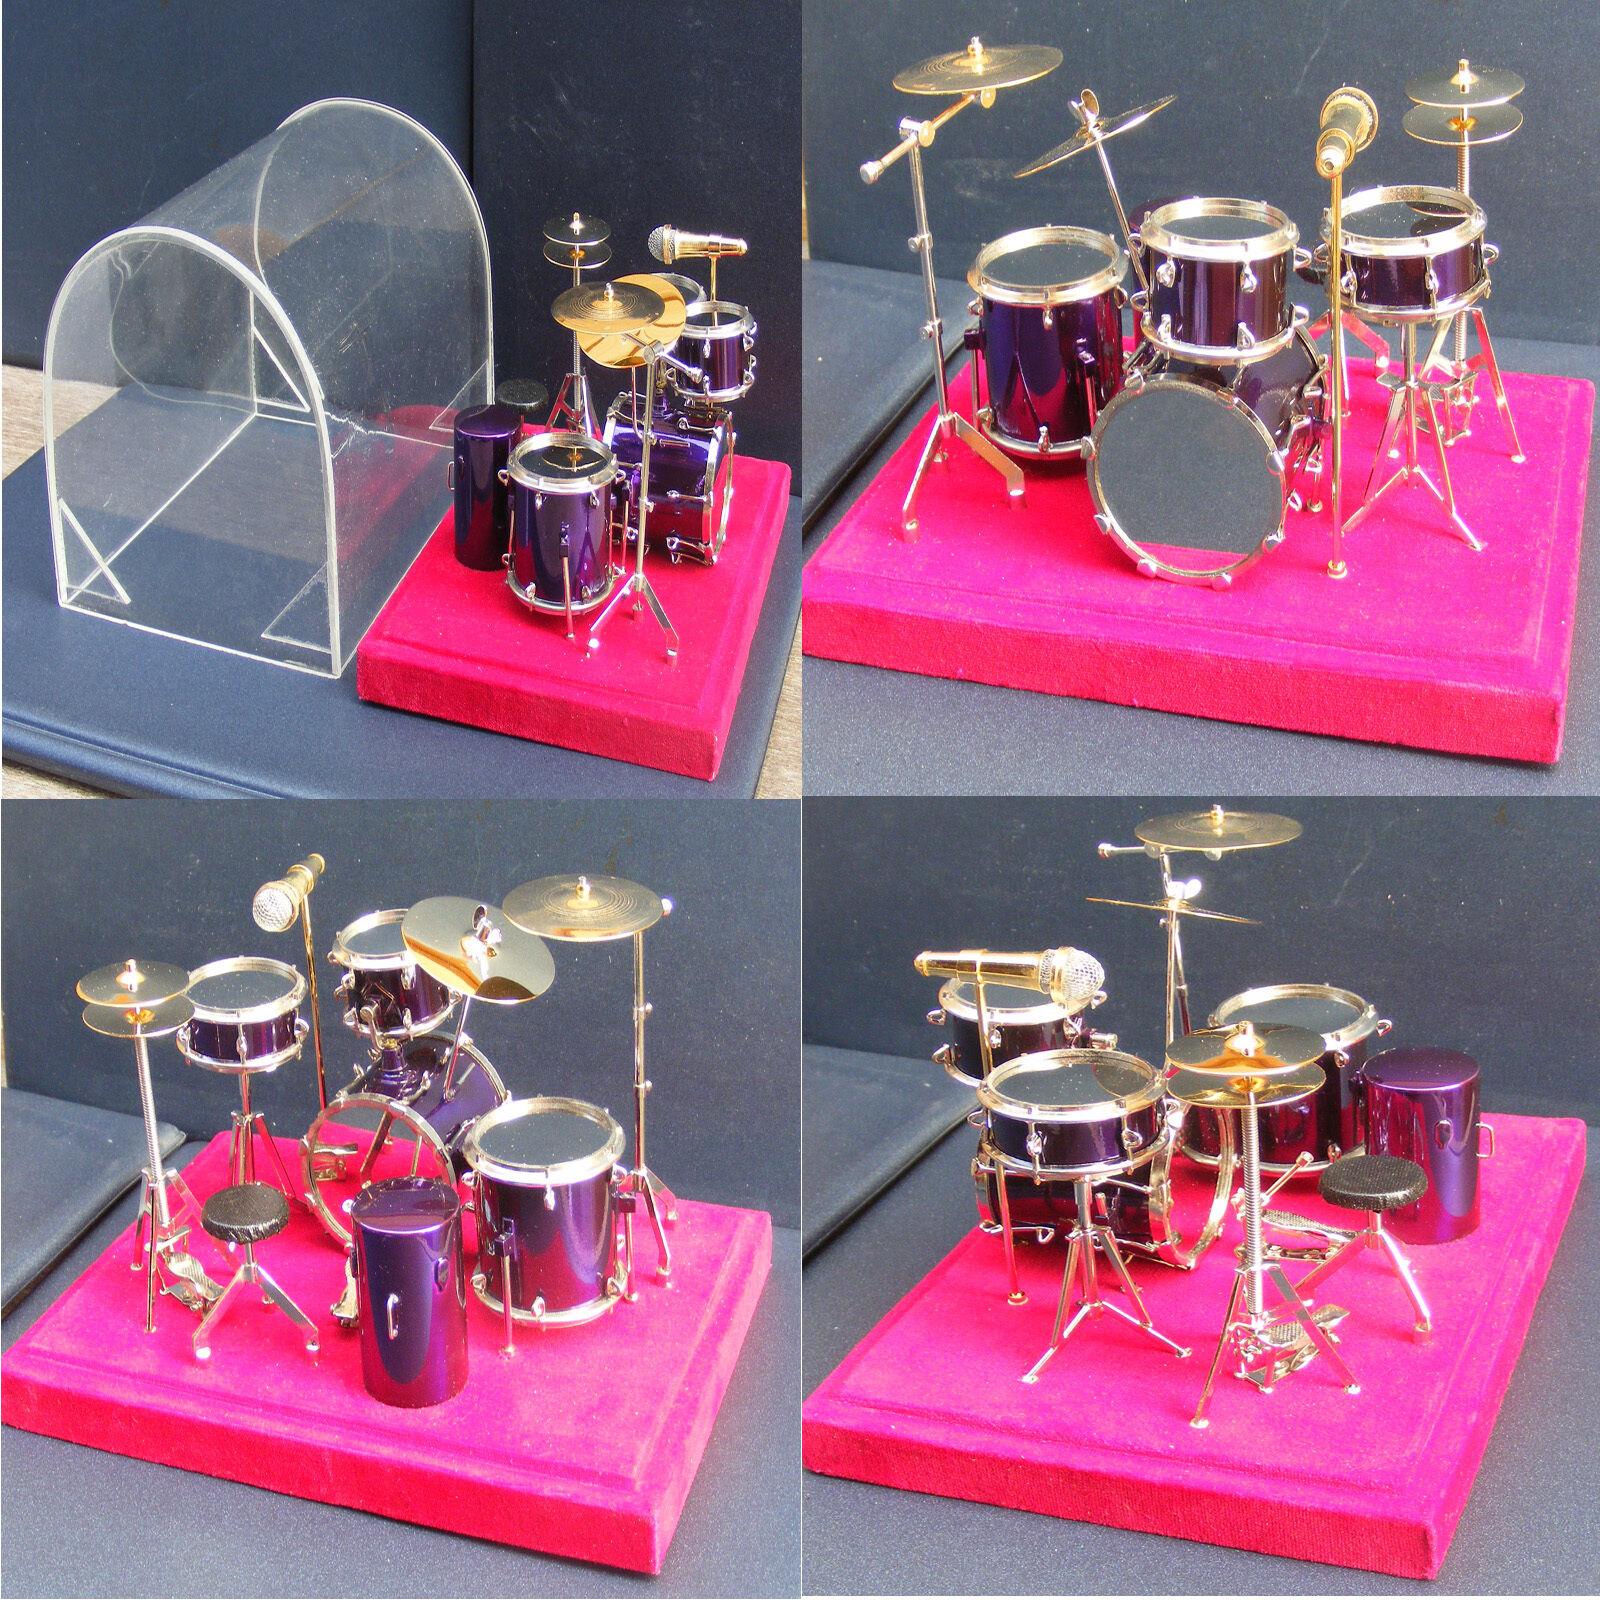 1:12 Scale lila Drum Kit & Case Tumdee Dolls House Music Instrument Accessory